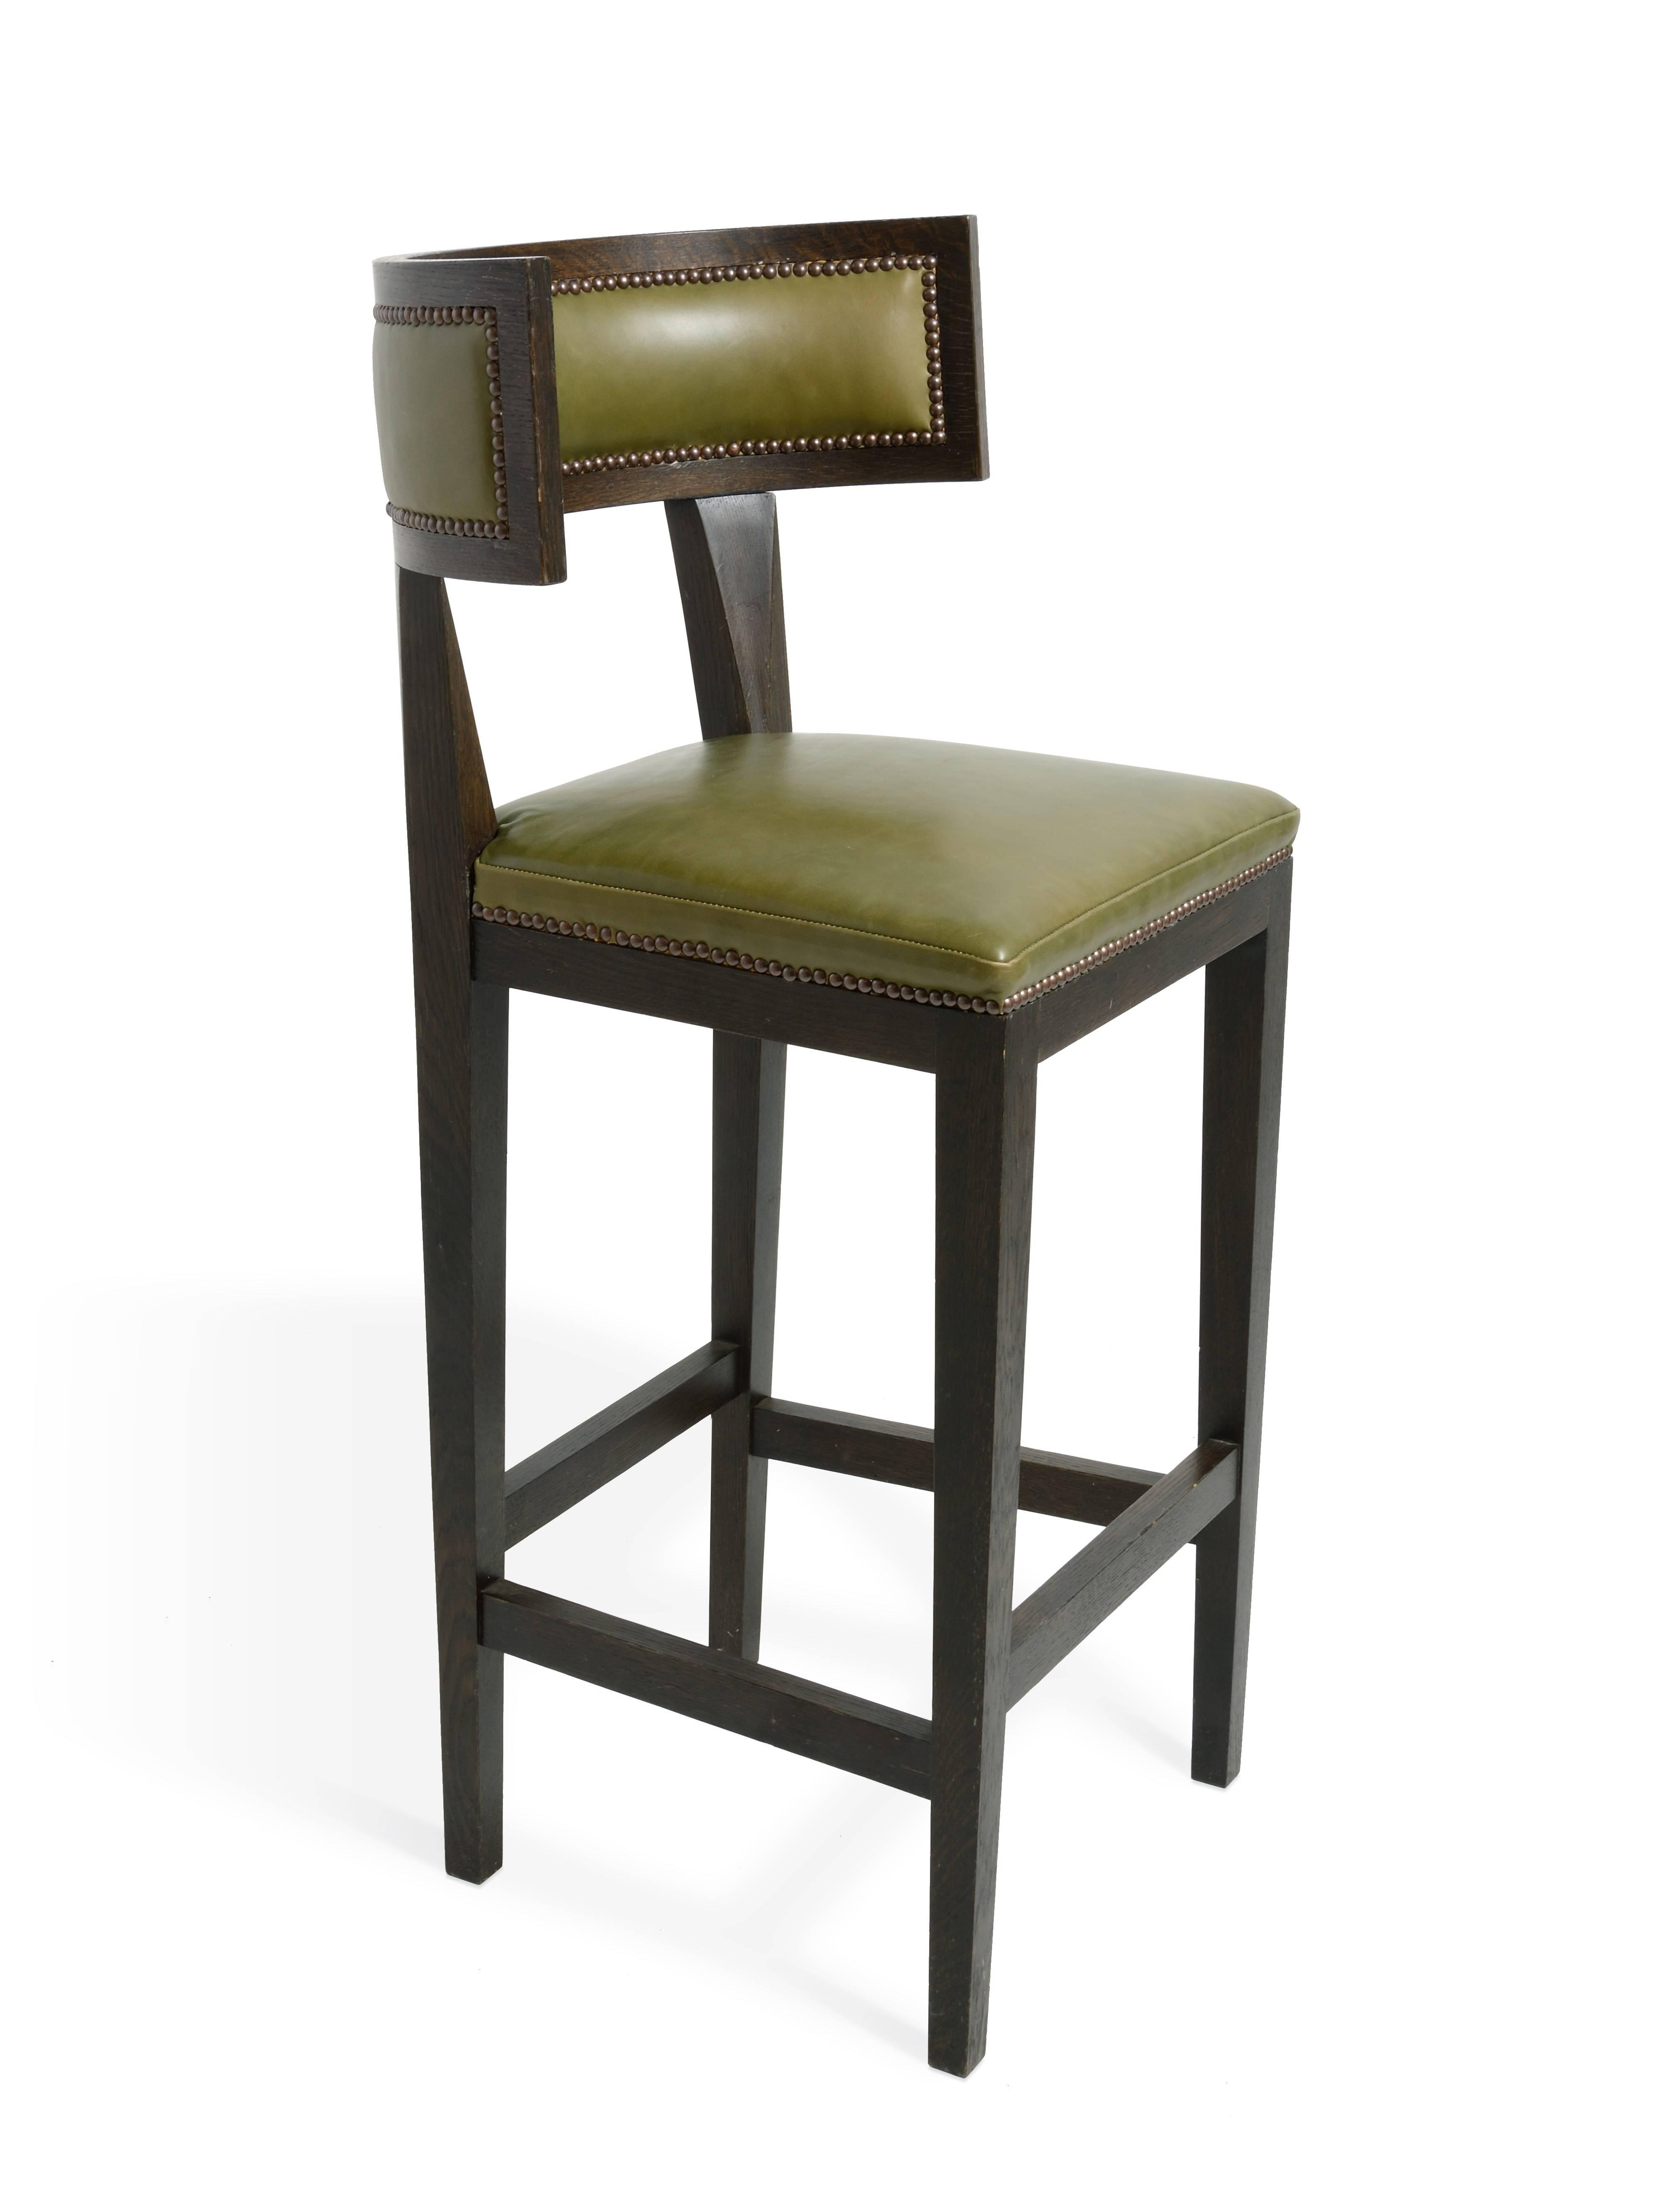 stools sources 09